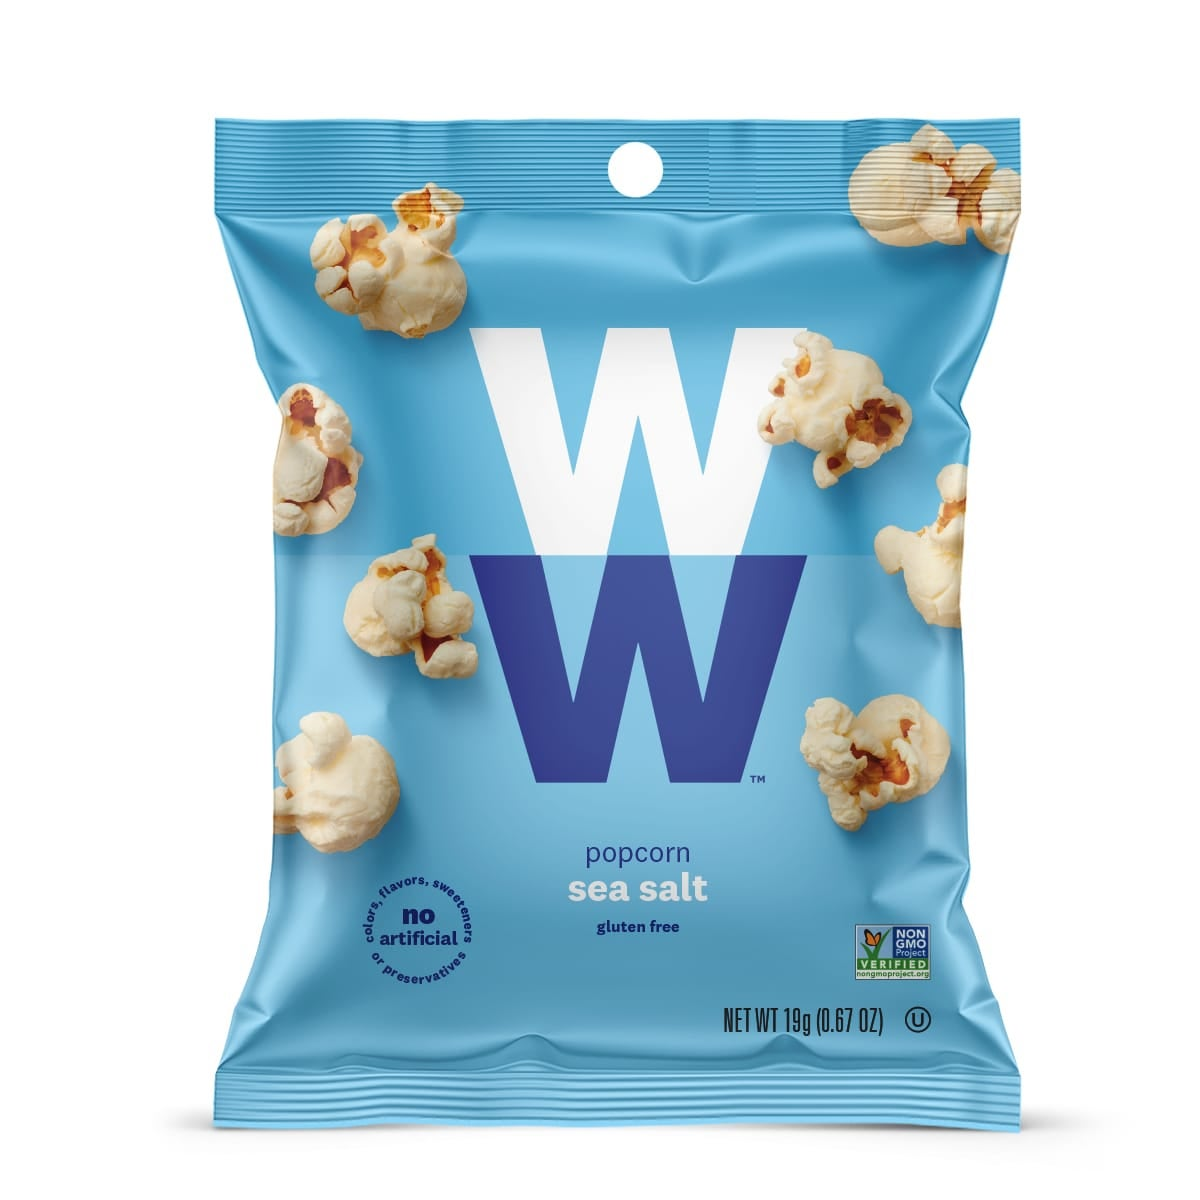 Sea Salt Popcorn - Pack of 6, front of bag, no artificial flavors